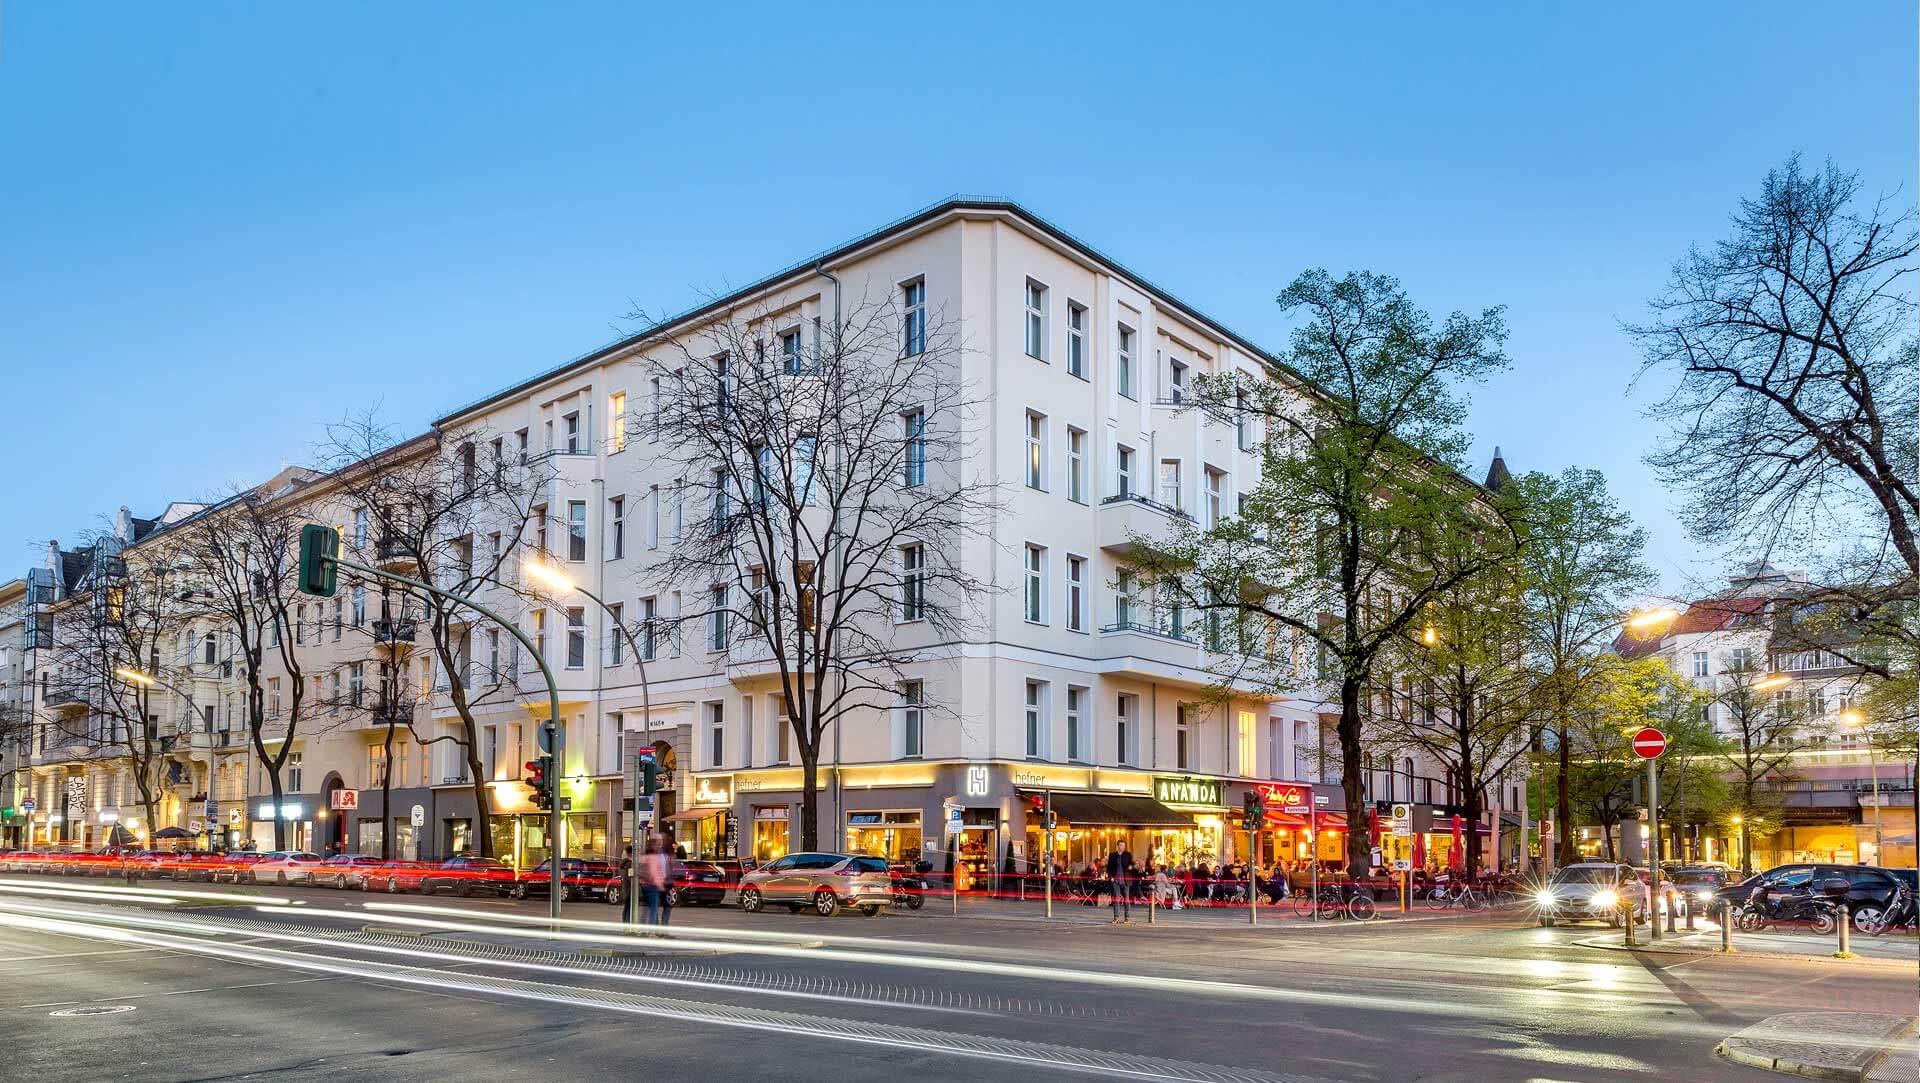 nachtaufnahme-altbau-fotografin-berlin